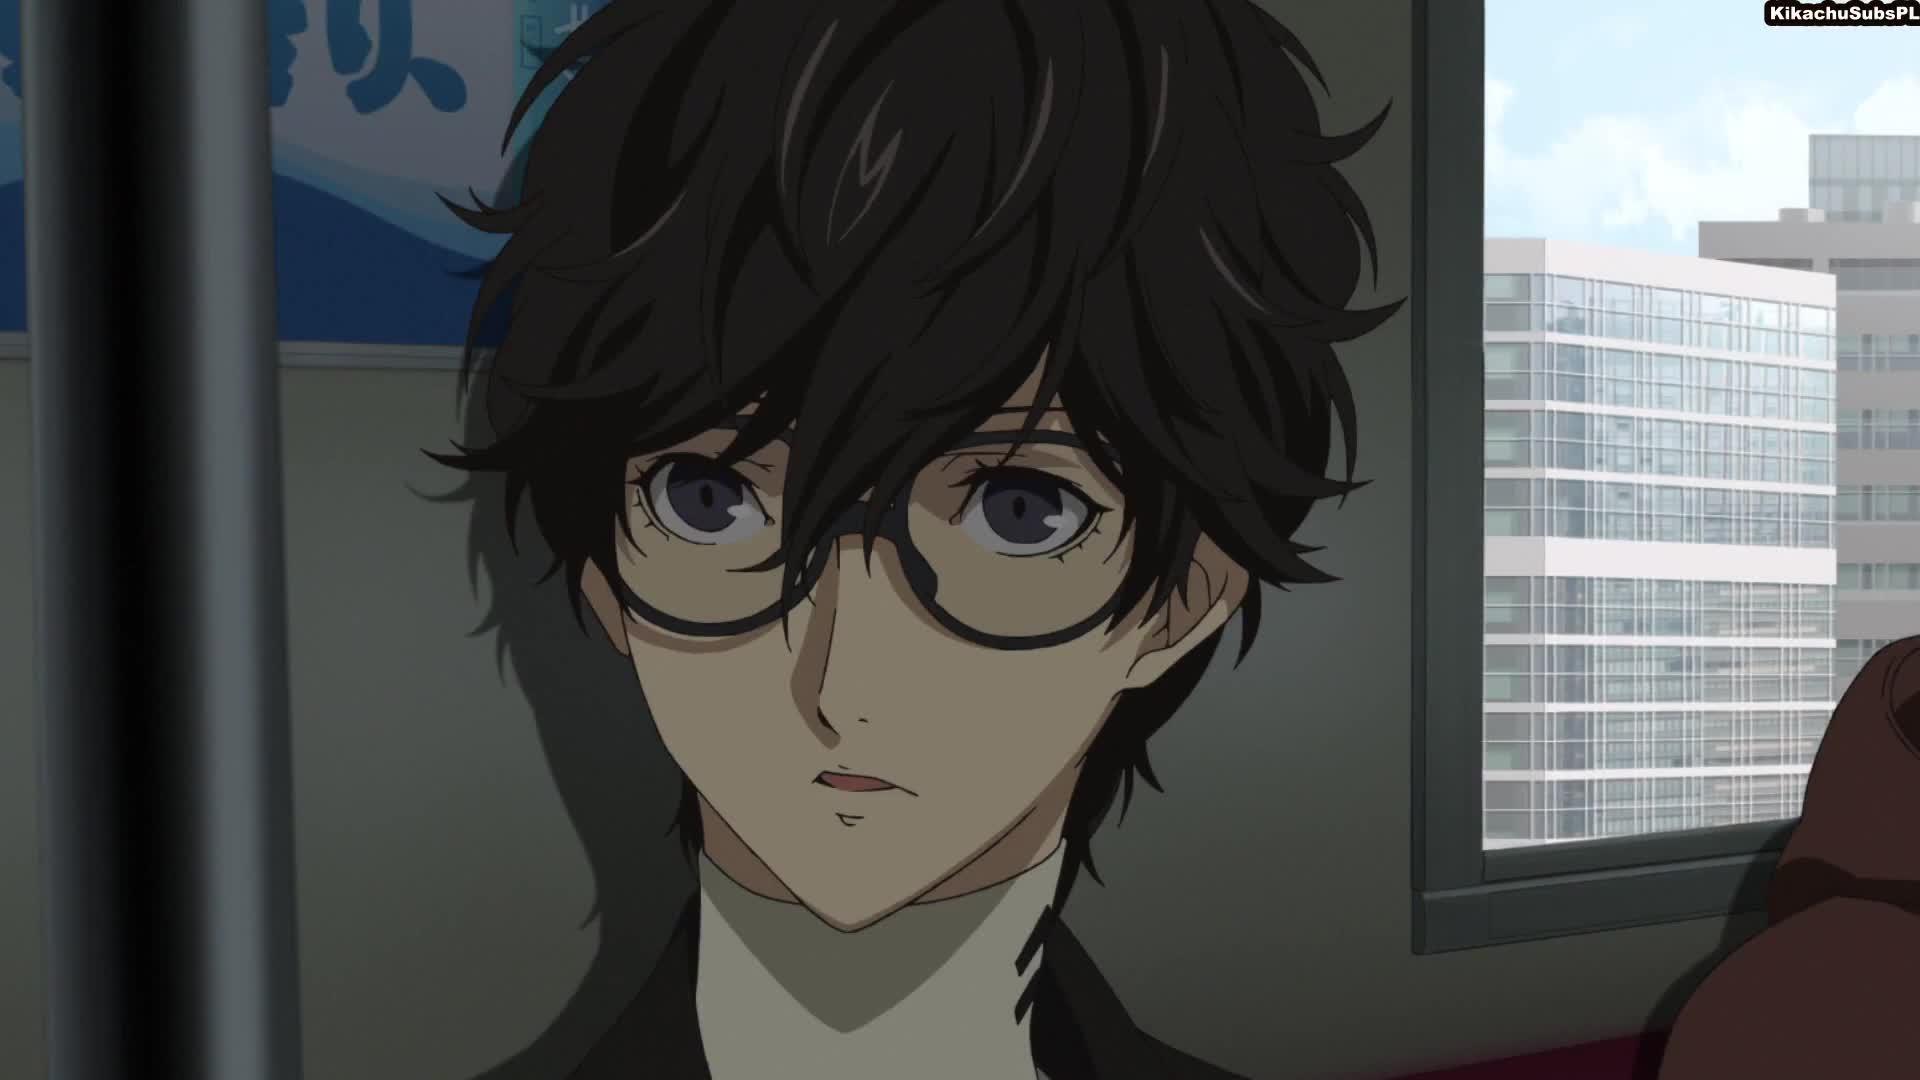 [KikachuSubsPL]Persona 5 The Animation 01 Napisy PL